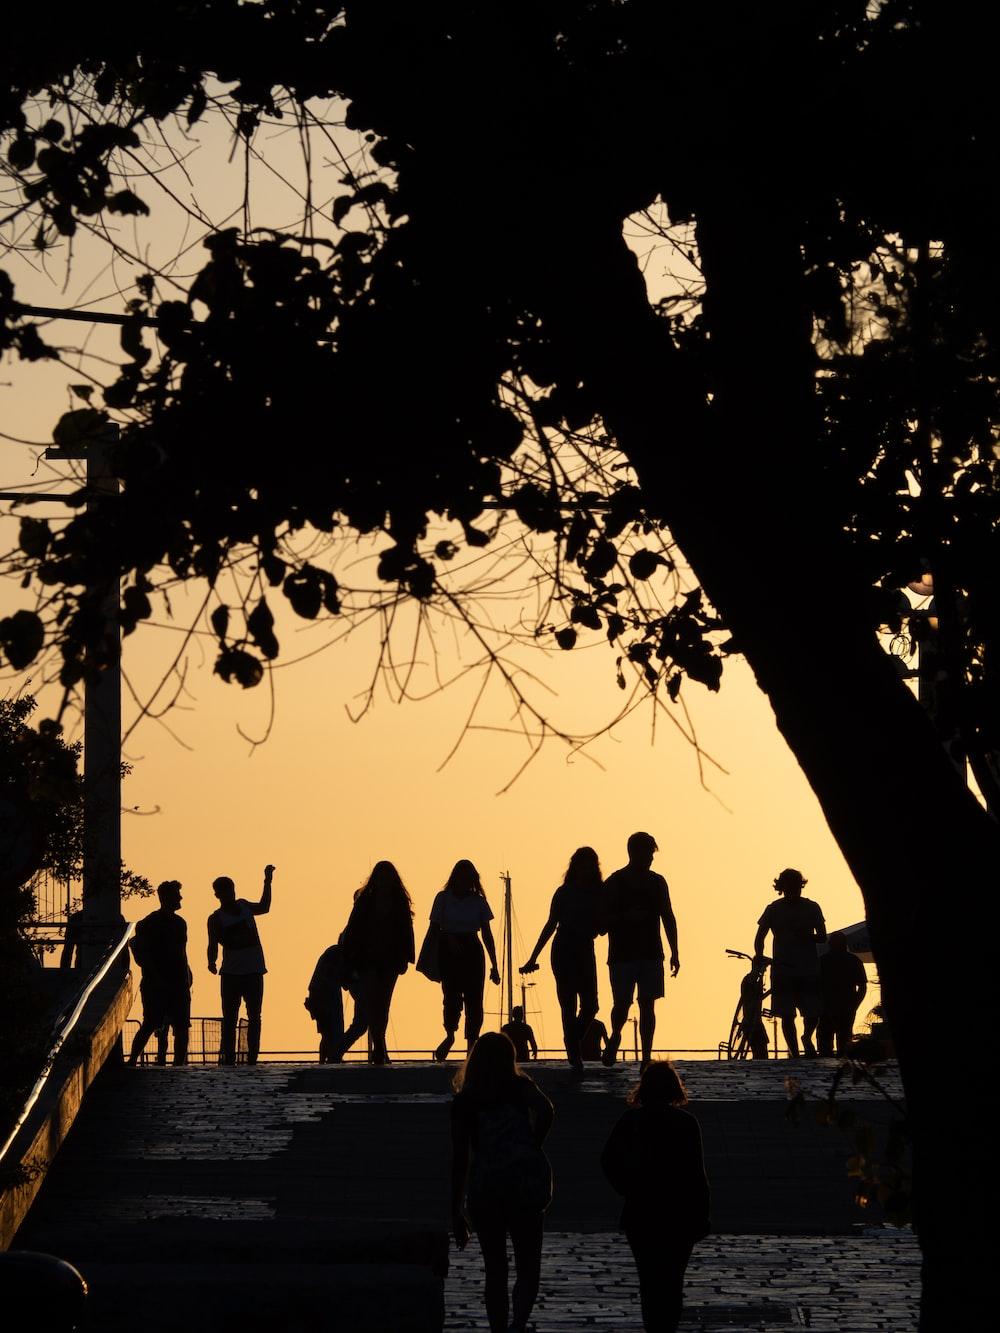 silhouette of people walking on sidewalk during sunset